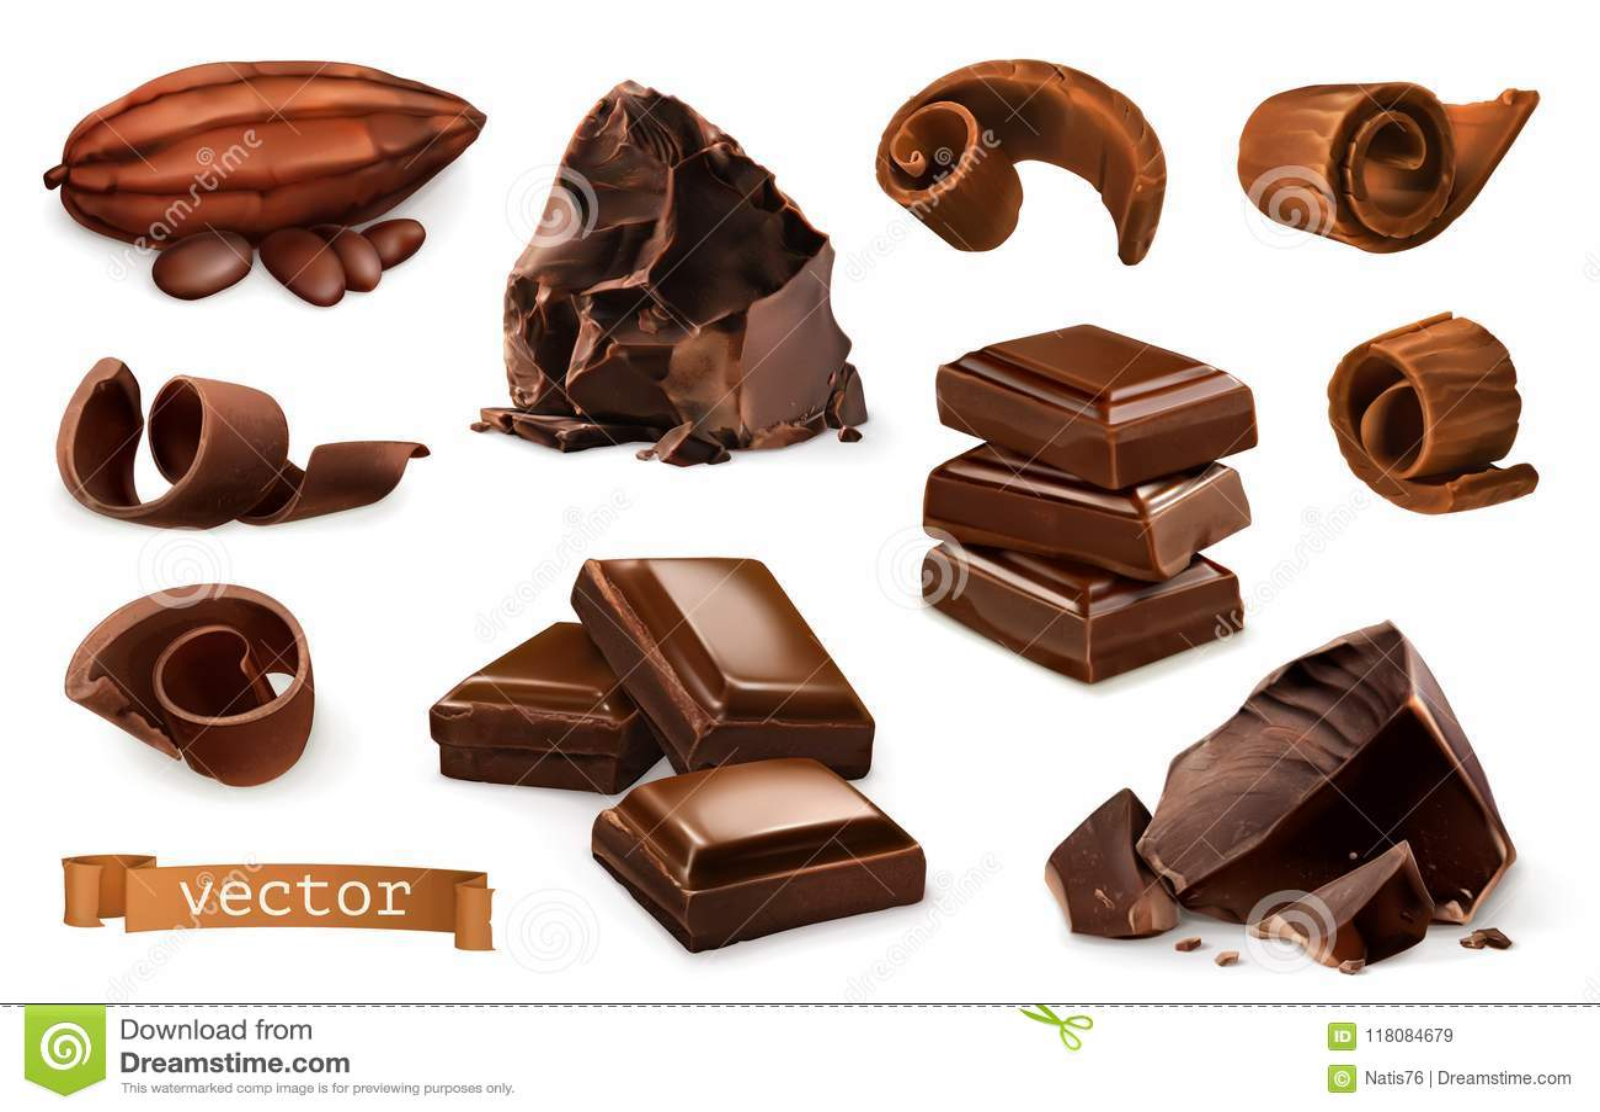 Schokolade Stücke, Schnitzel, Kakaofrucht Ikonensatz des Vektors 3d